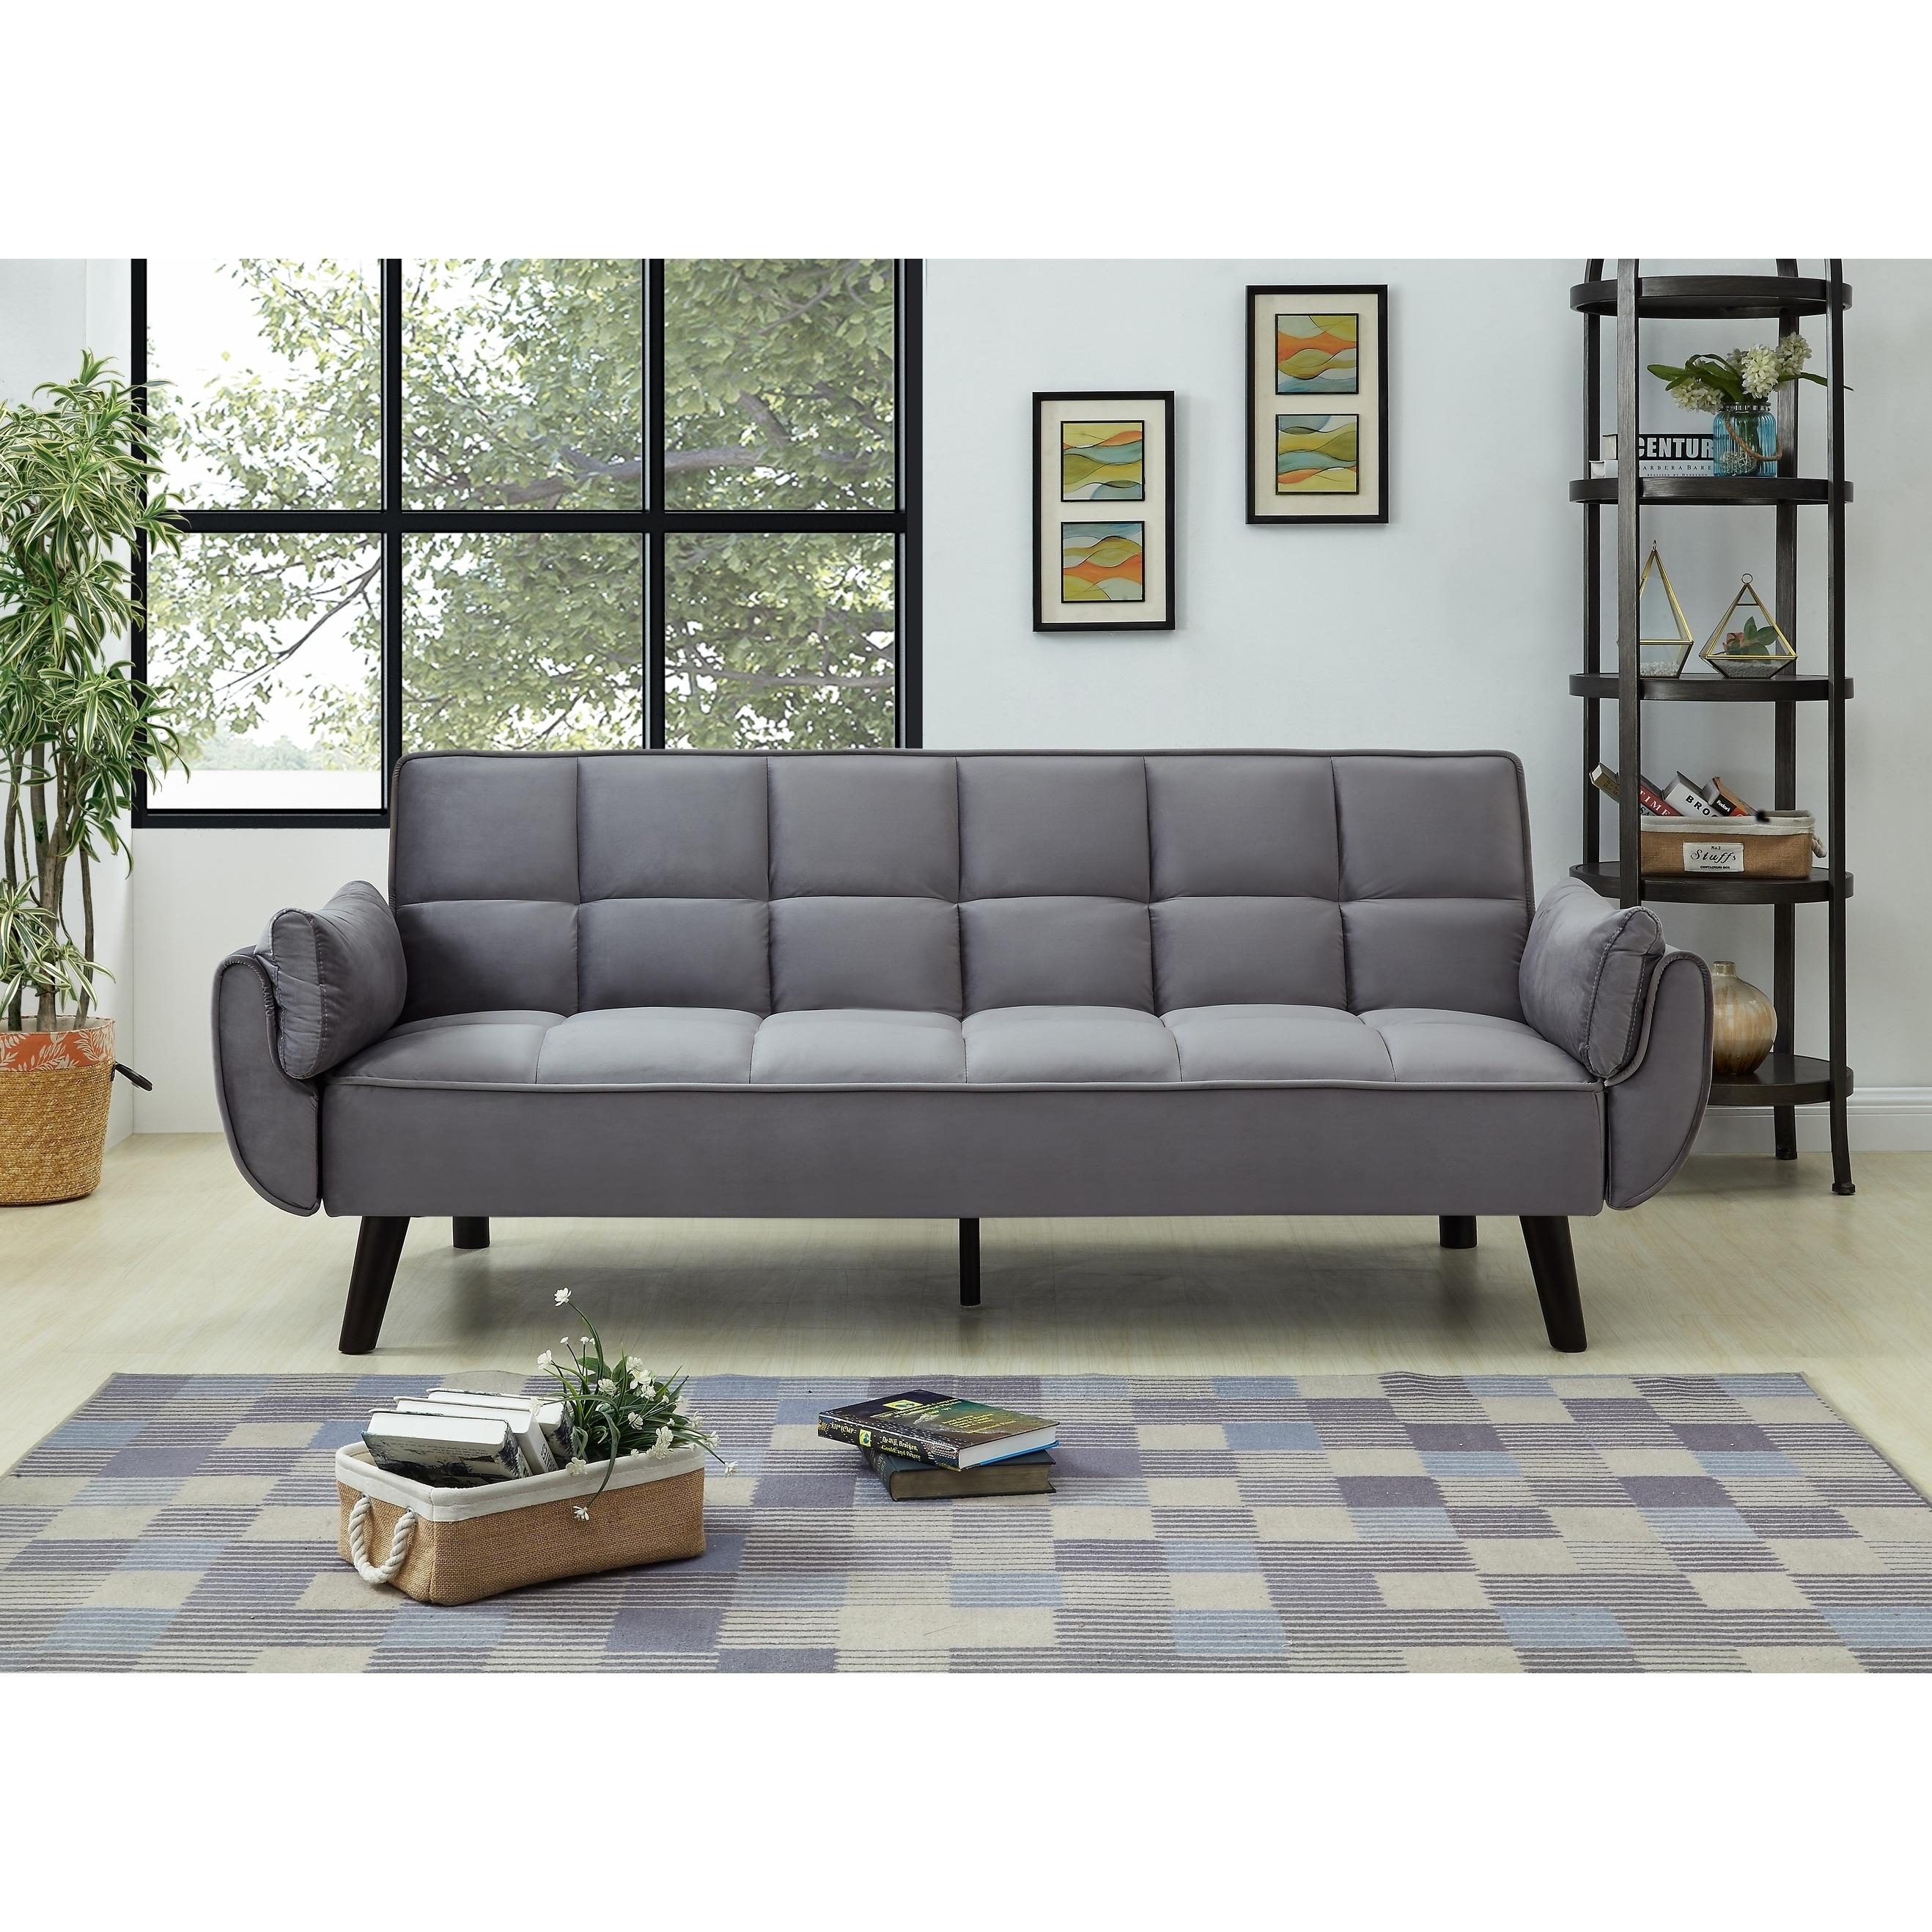 Best quality furniture velvet tufted sofa bed